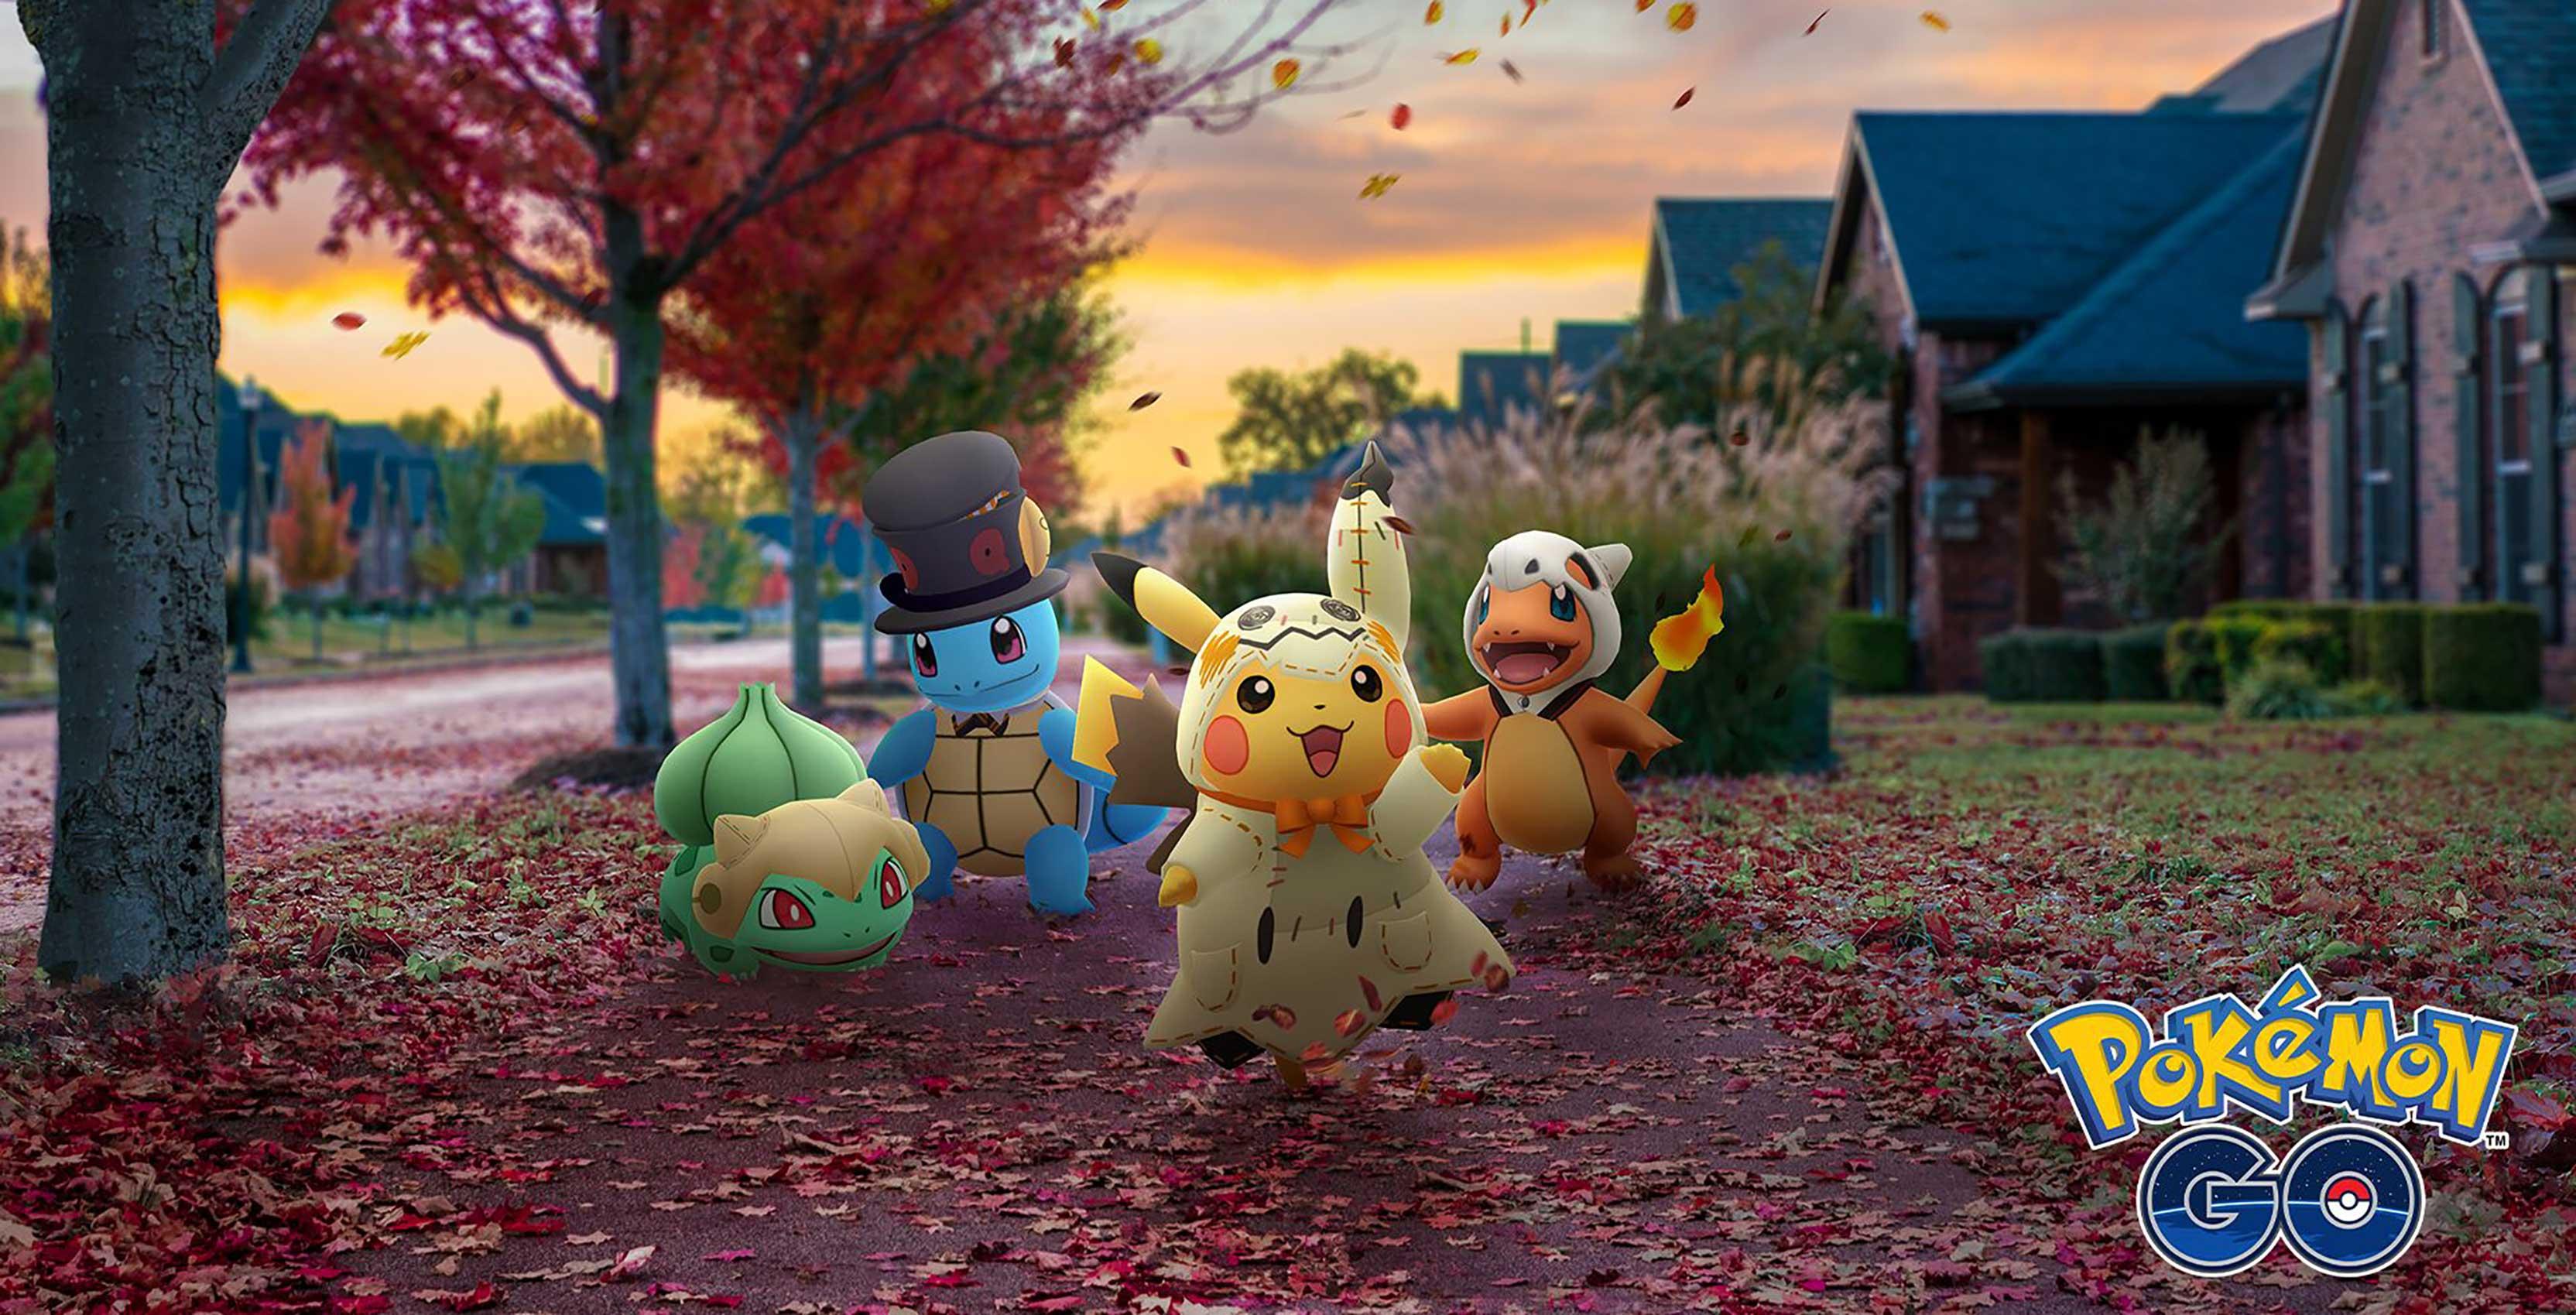 Pokémon Go celebrates Halloween with Darkrai and costumed monsters